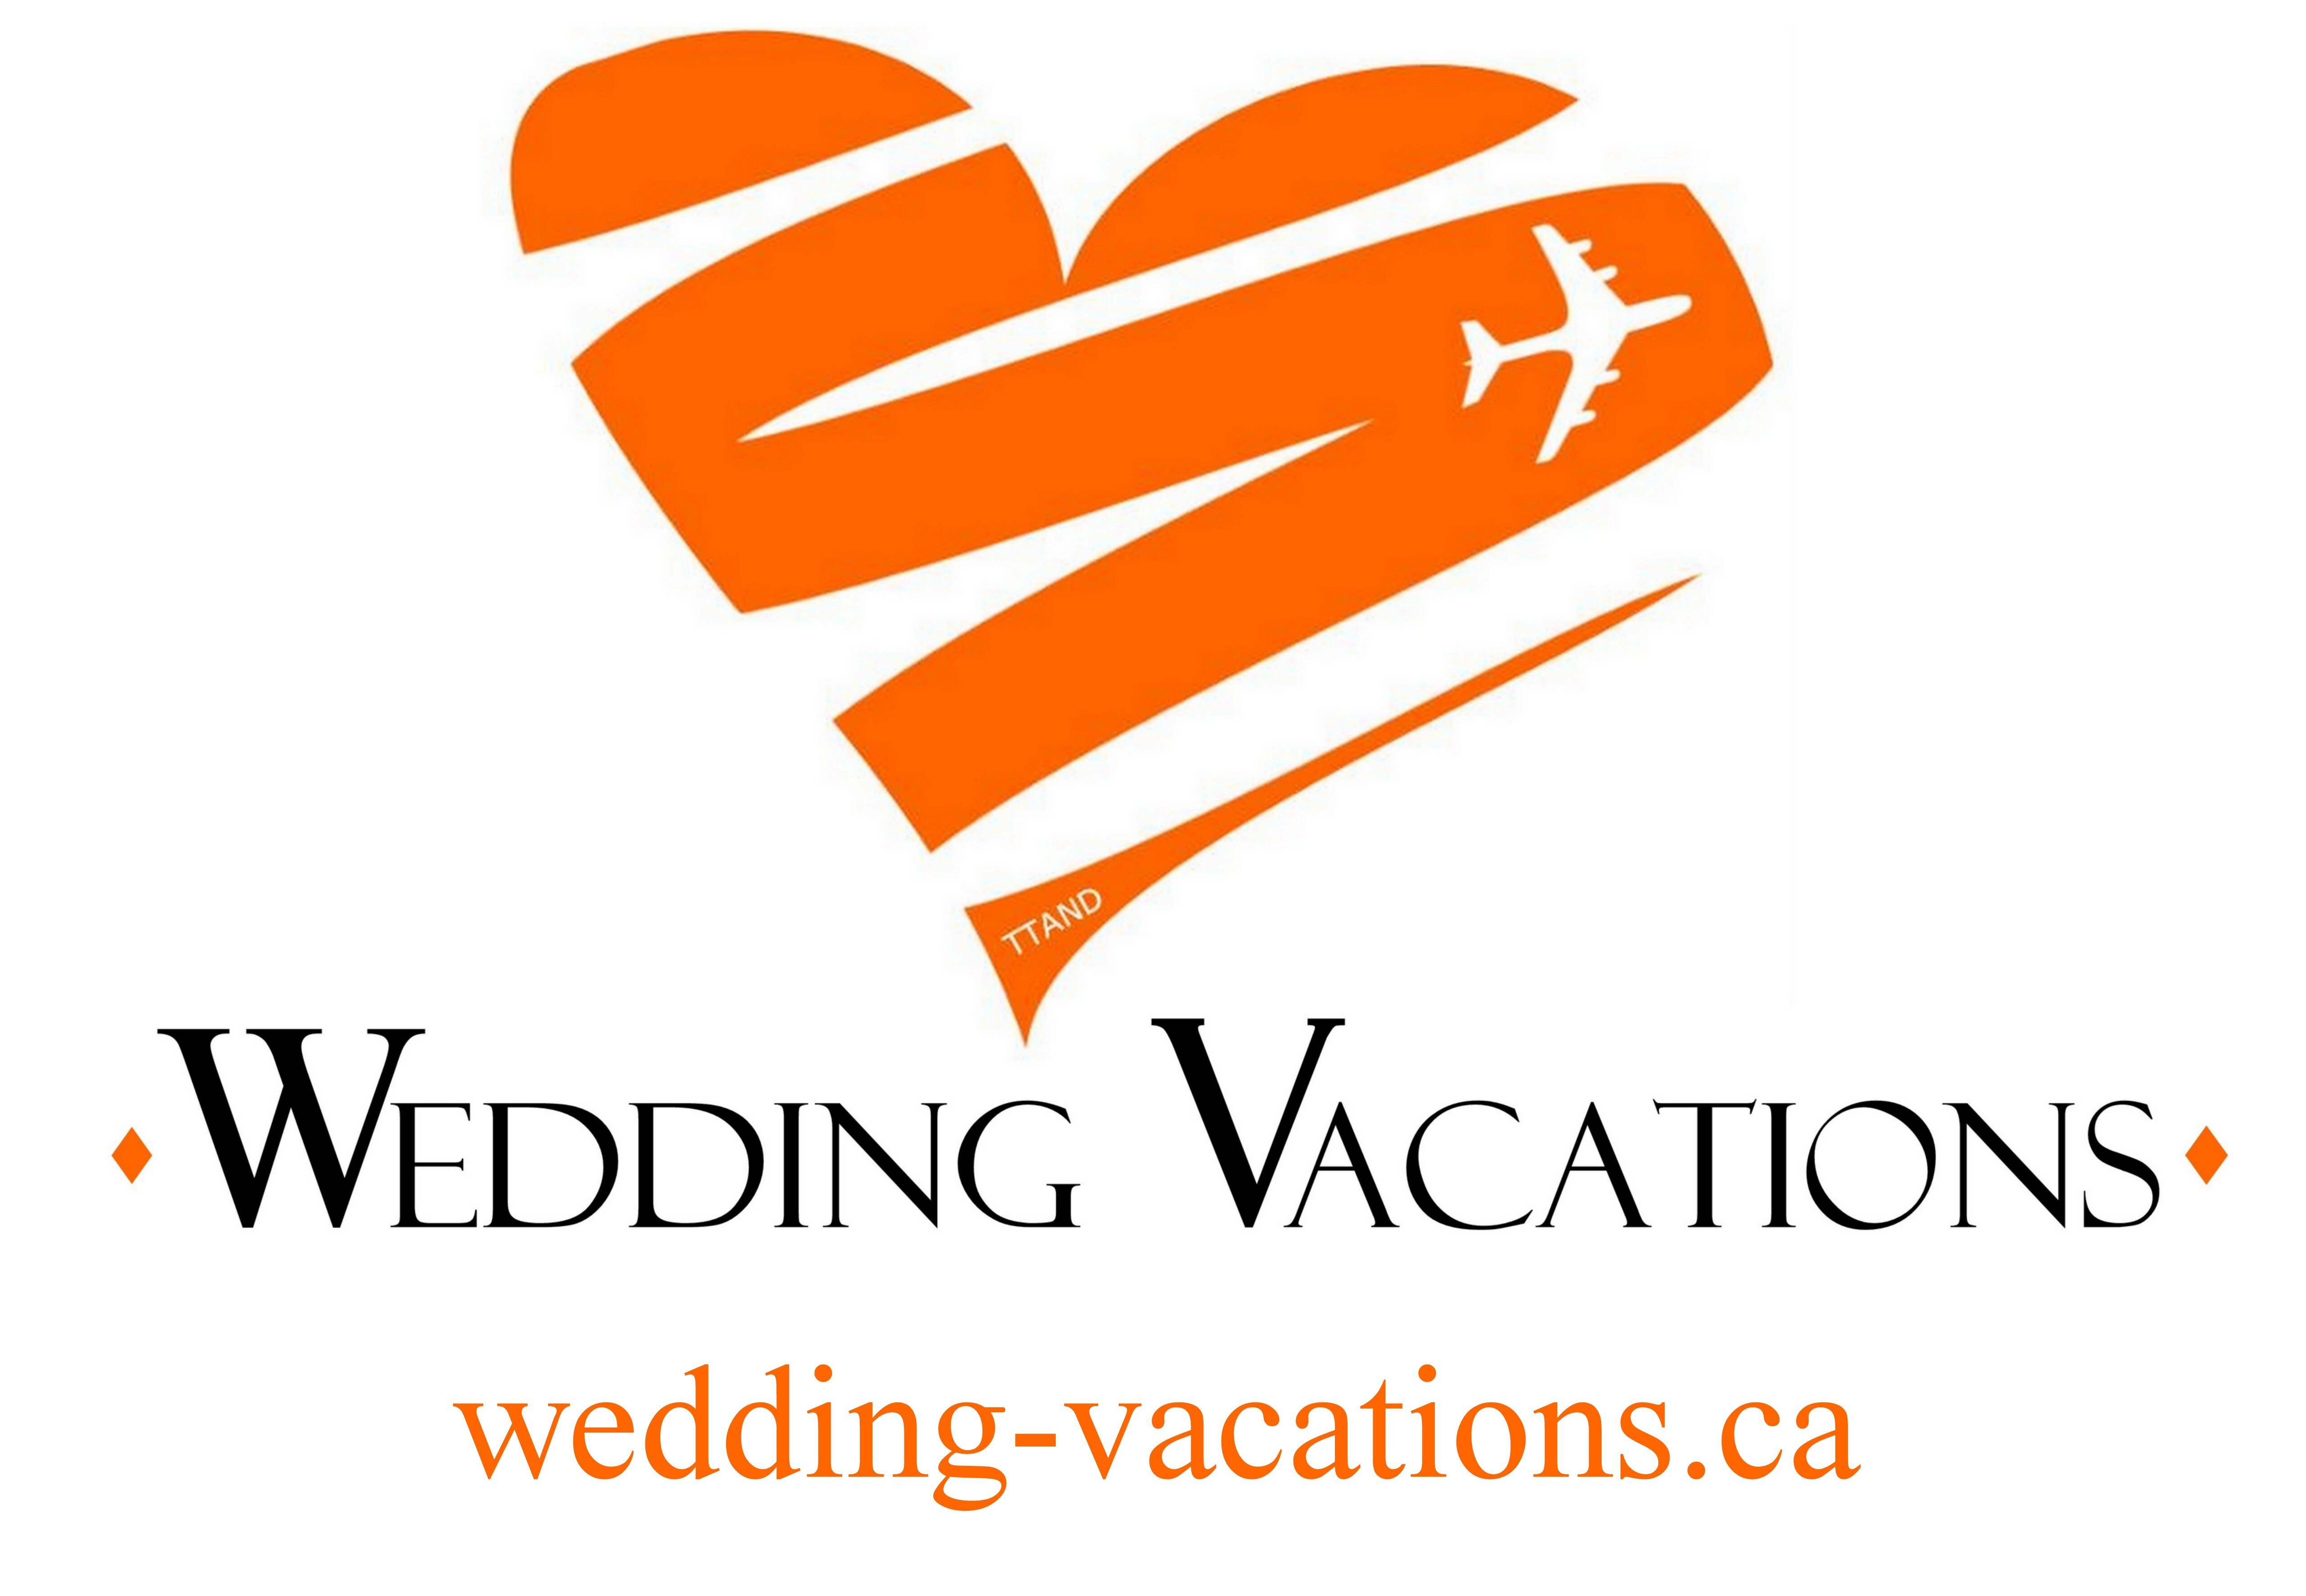 Destination Wedding wedding-vacations.ca